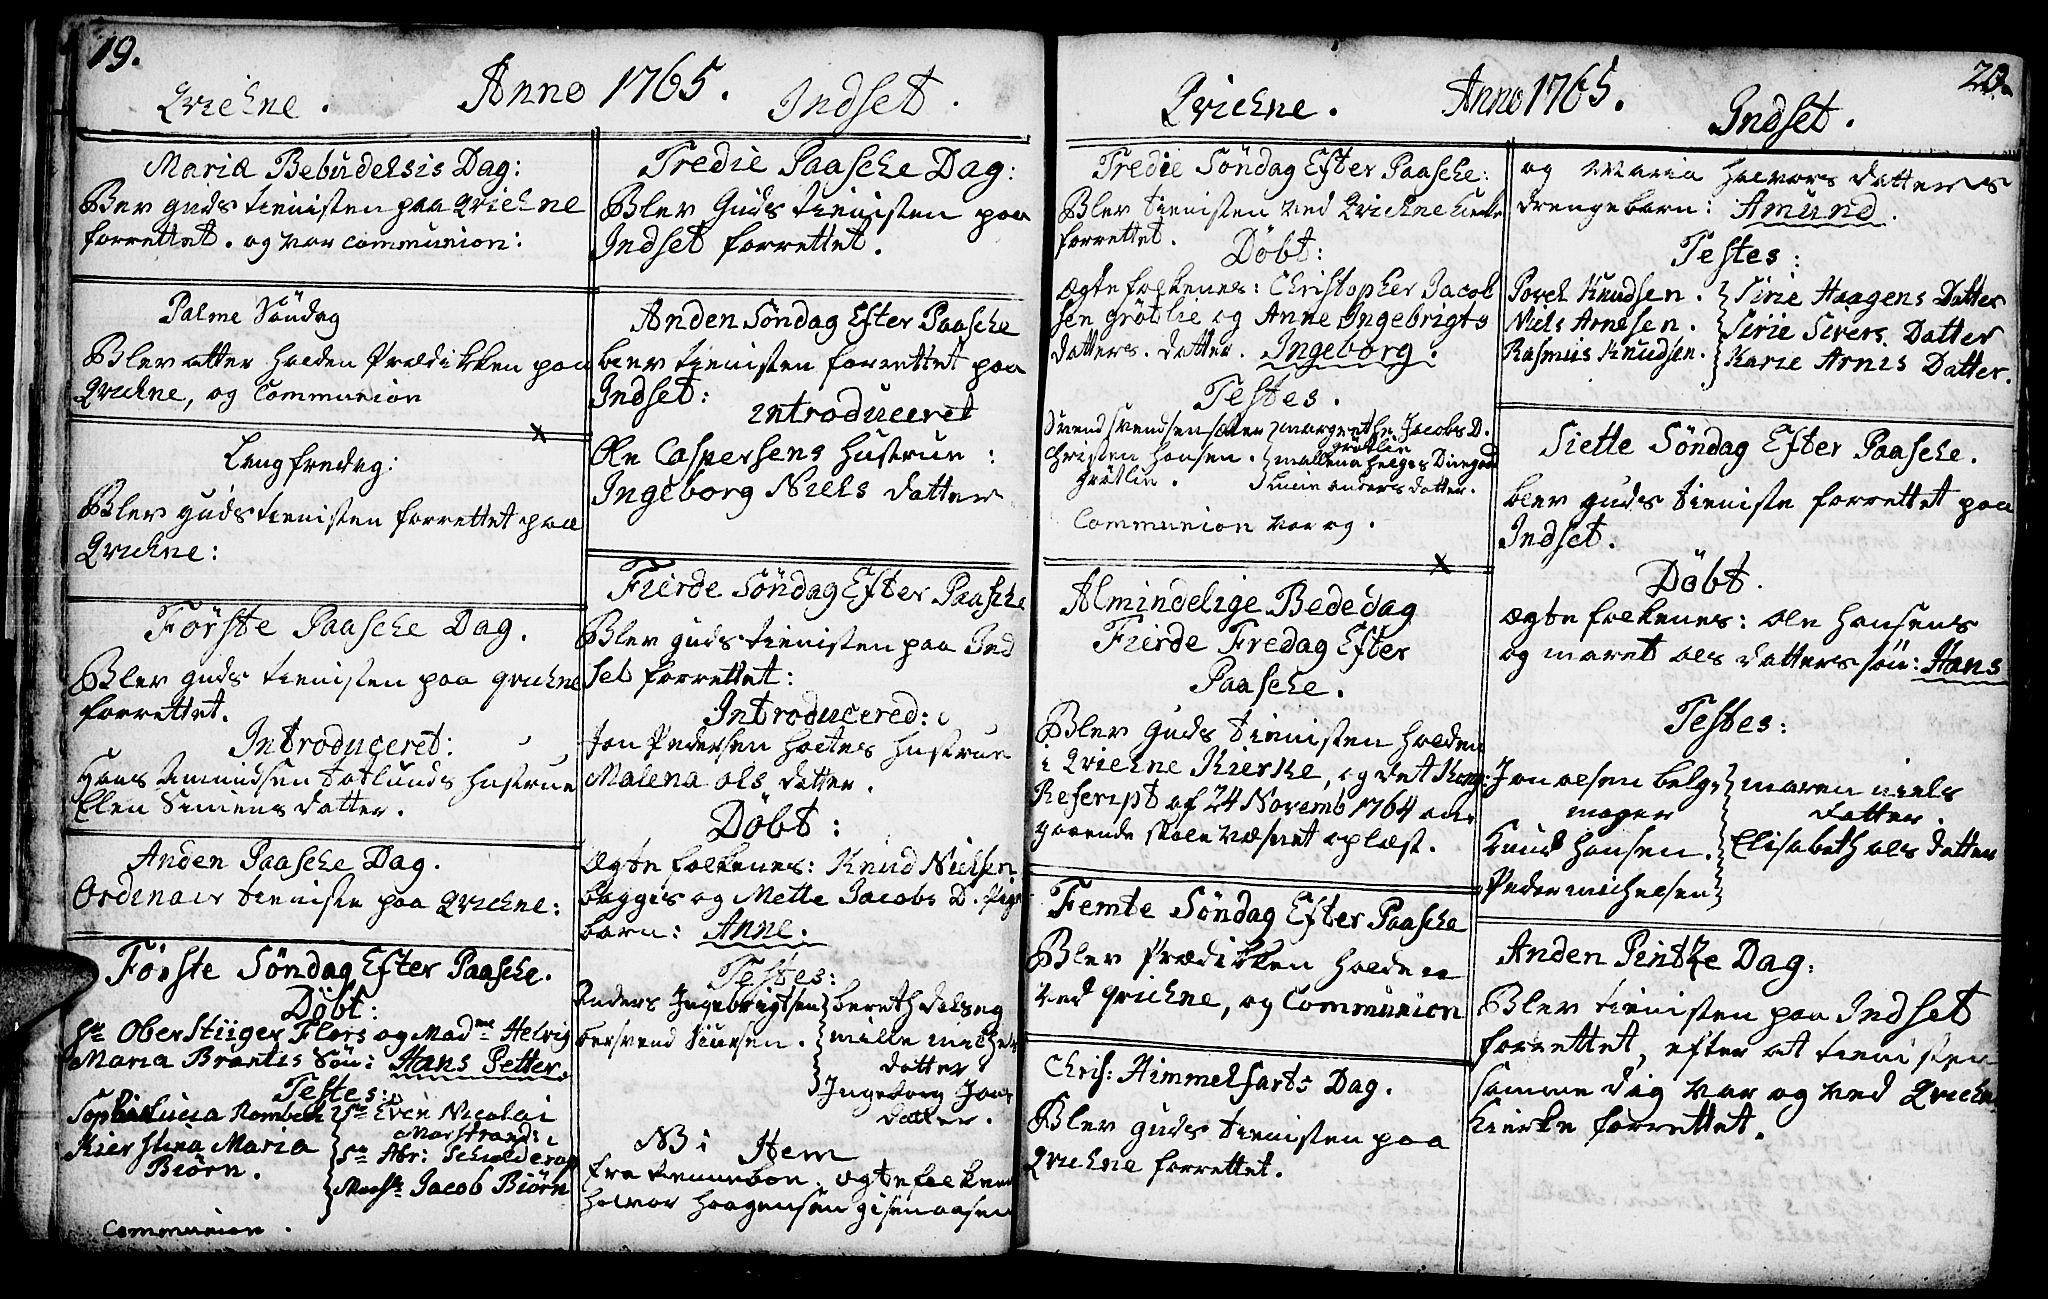 SAH, Kvikne prestekontor, Ministerialbok nr. 2, 1764-1784, s. 19-20